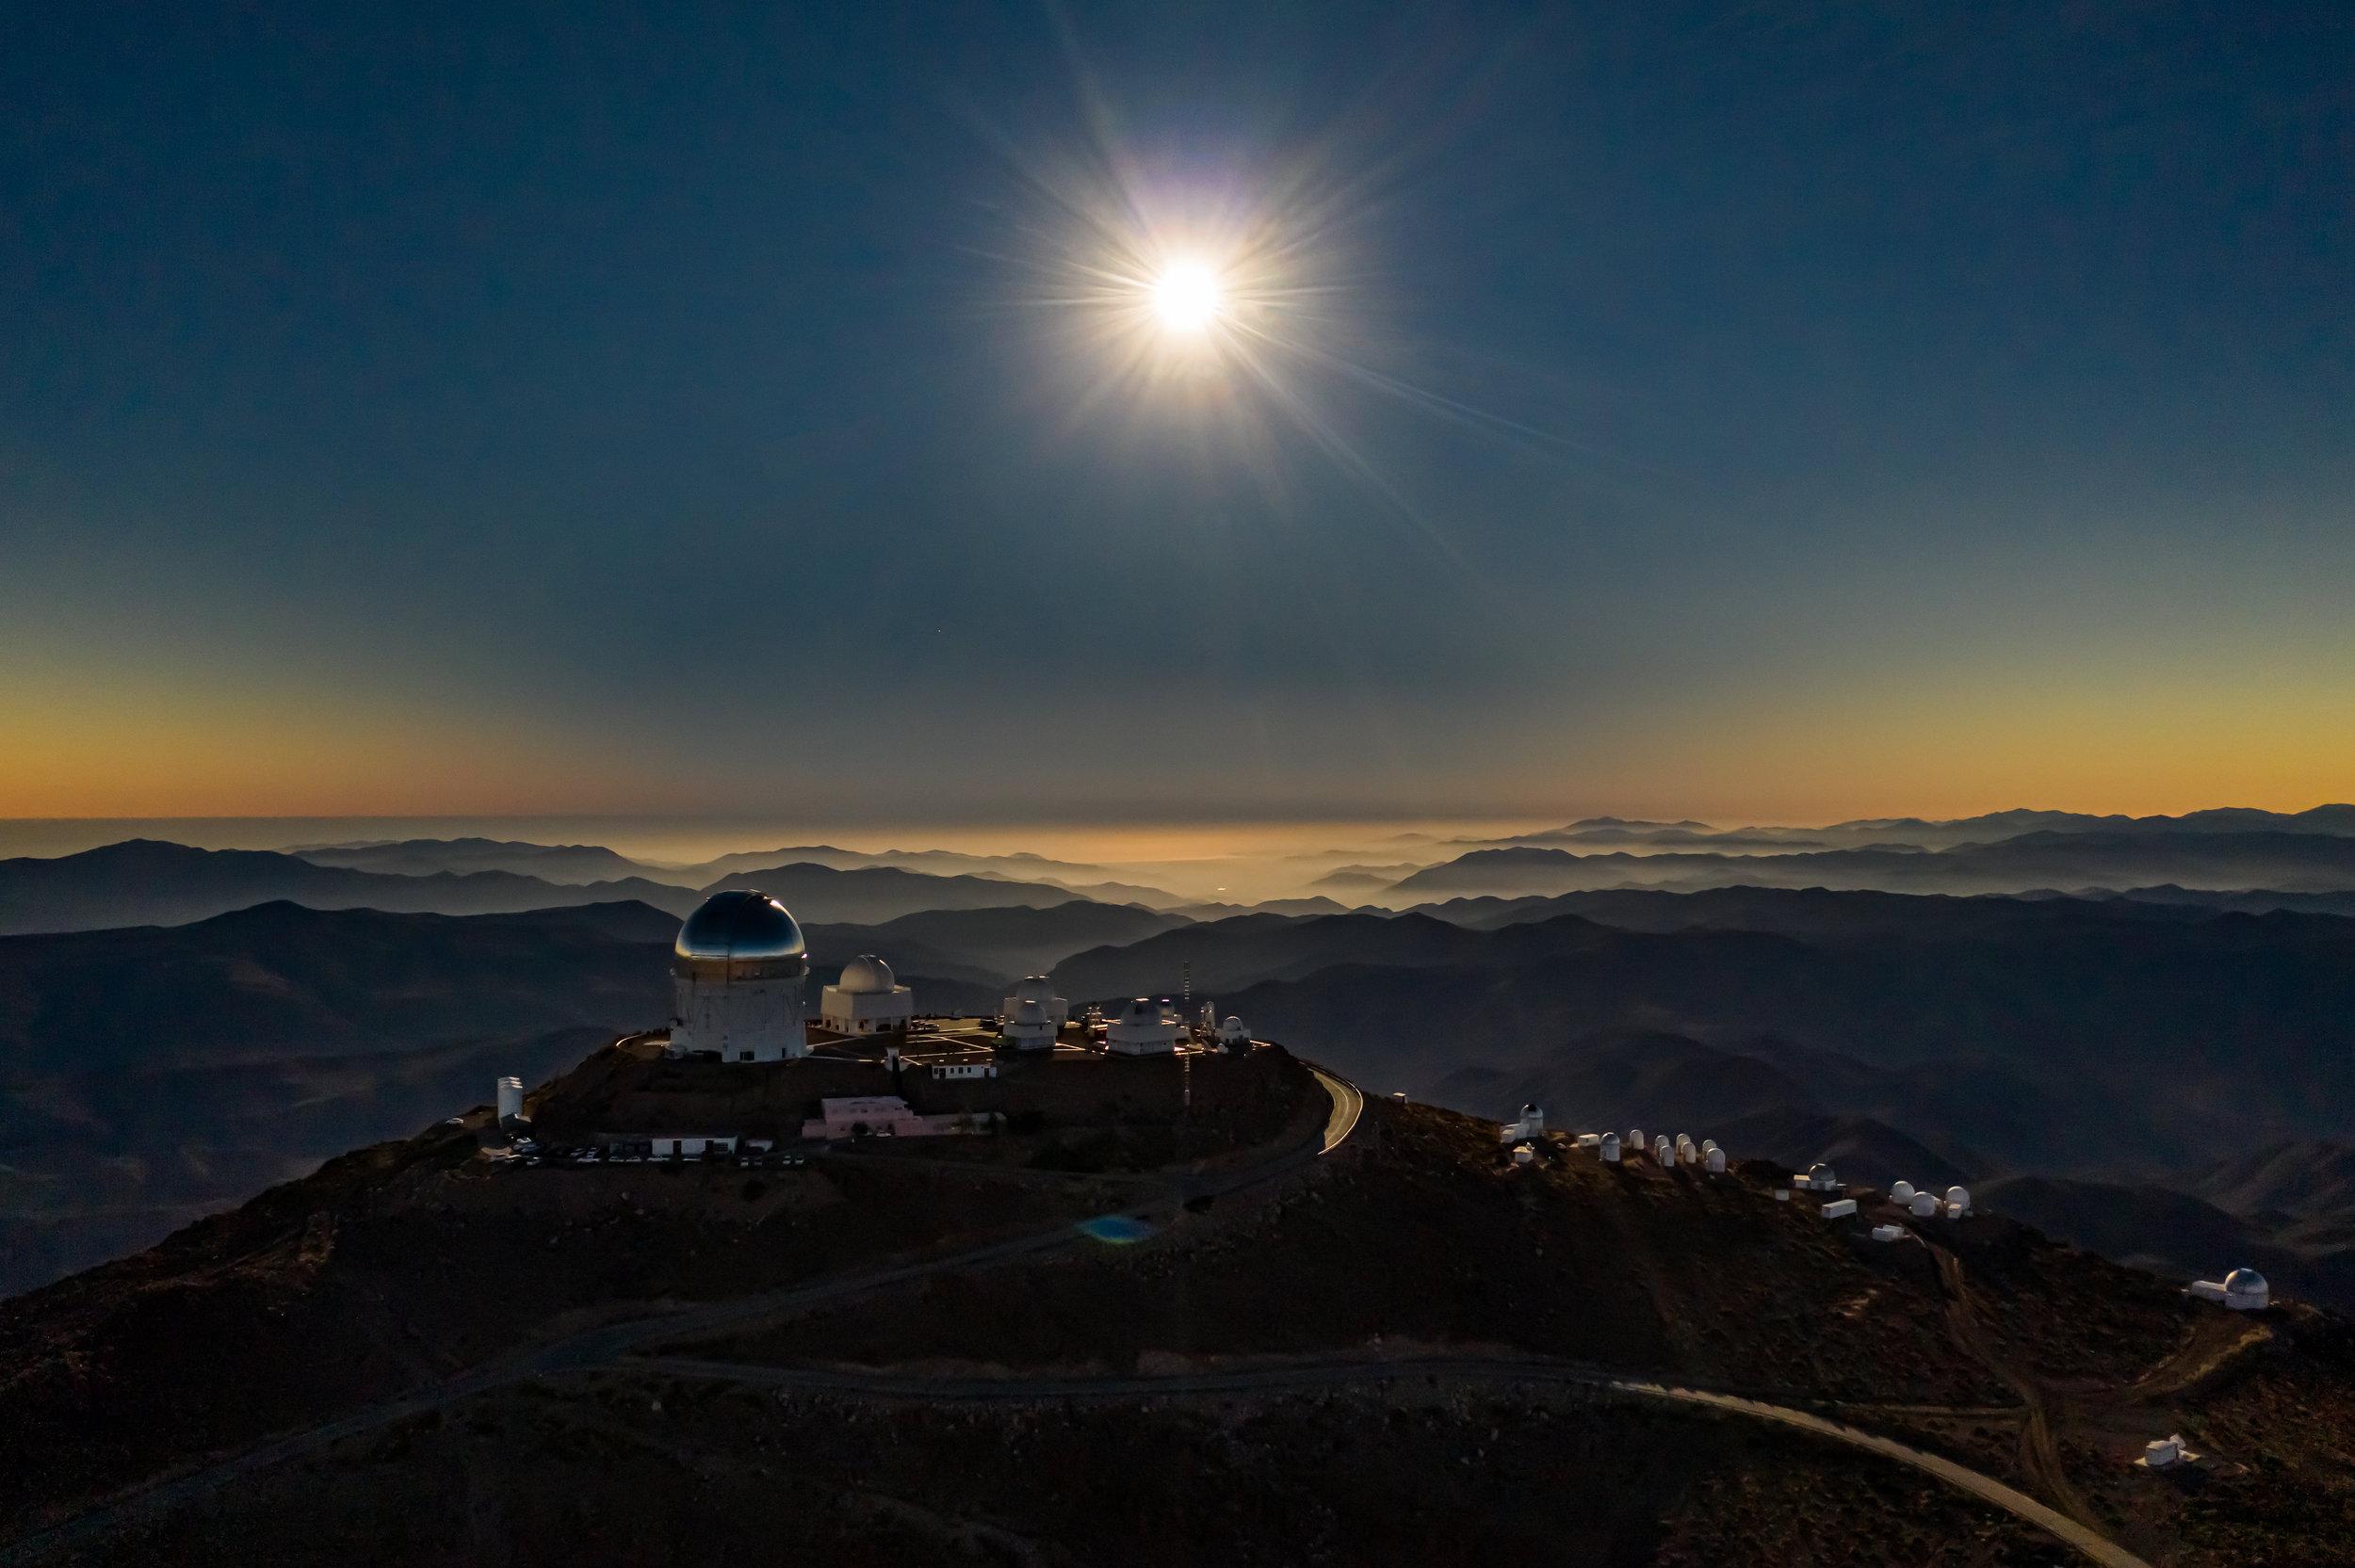 Cerro Tololo Inter-American Observatory, moments before total solar eclipse